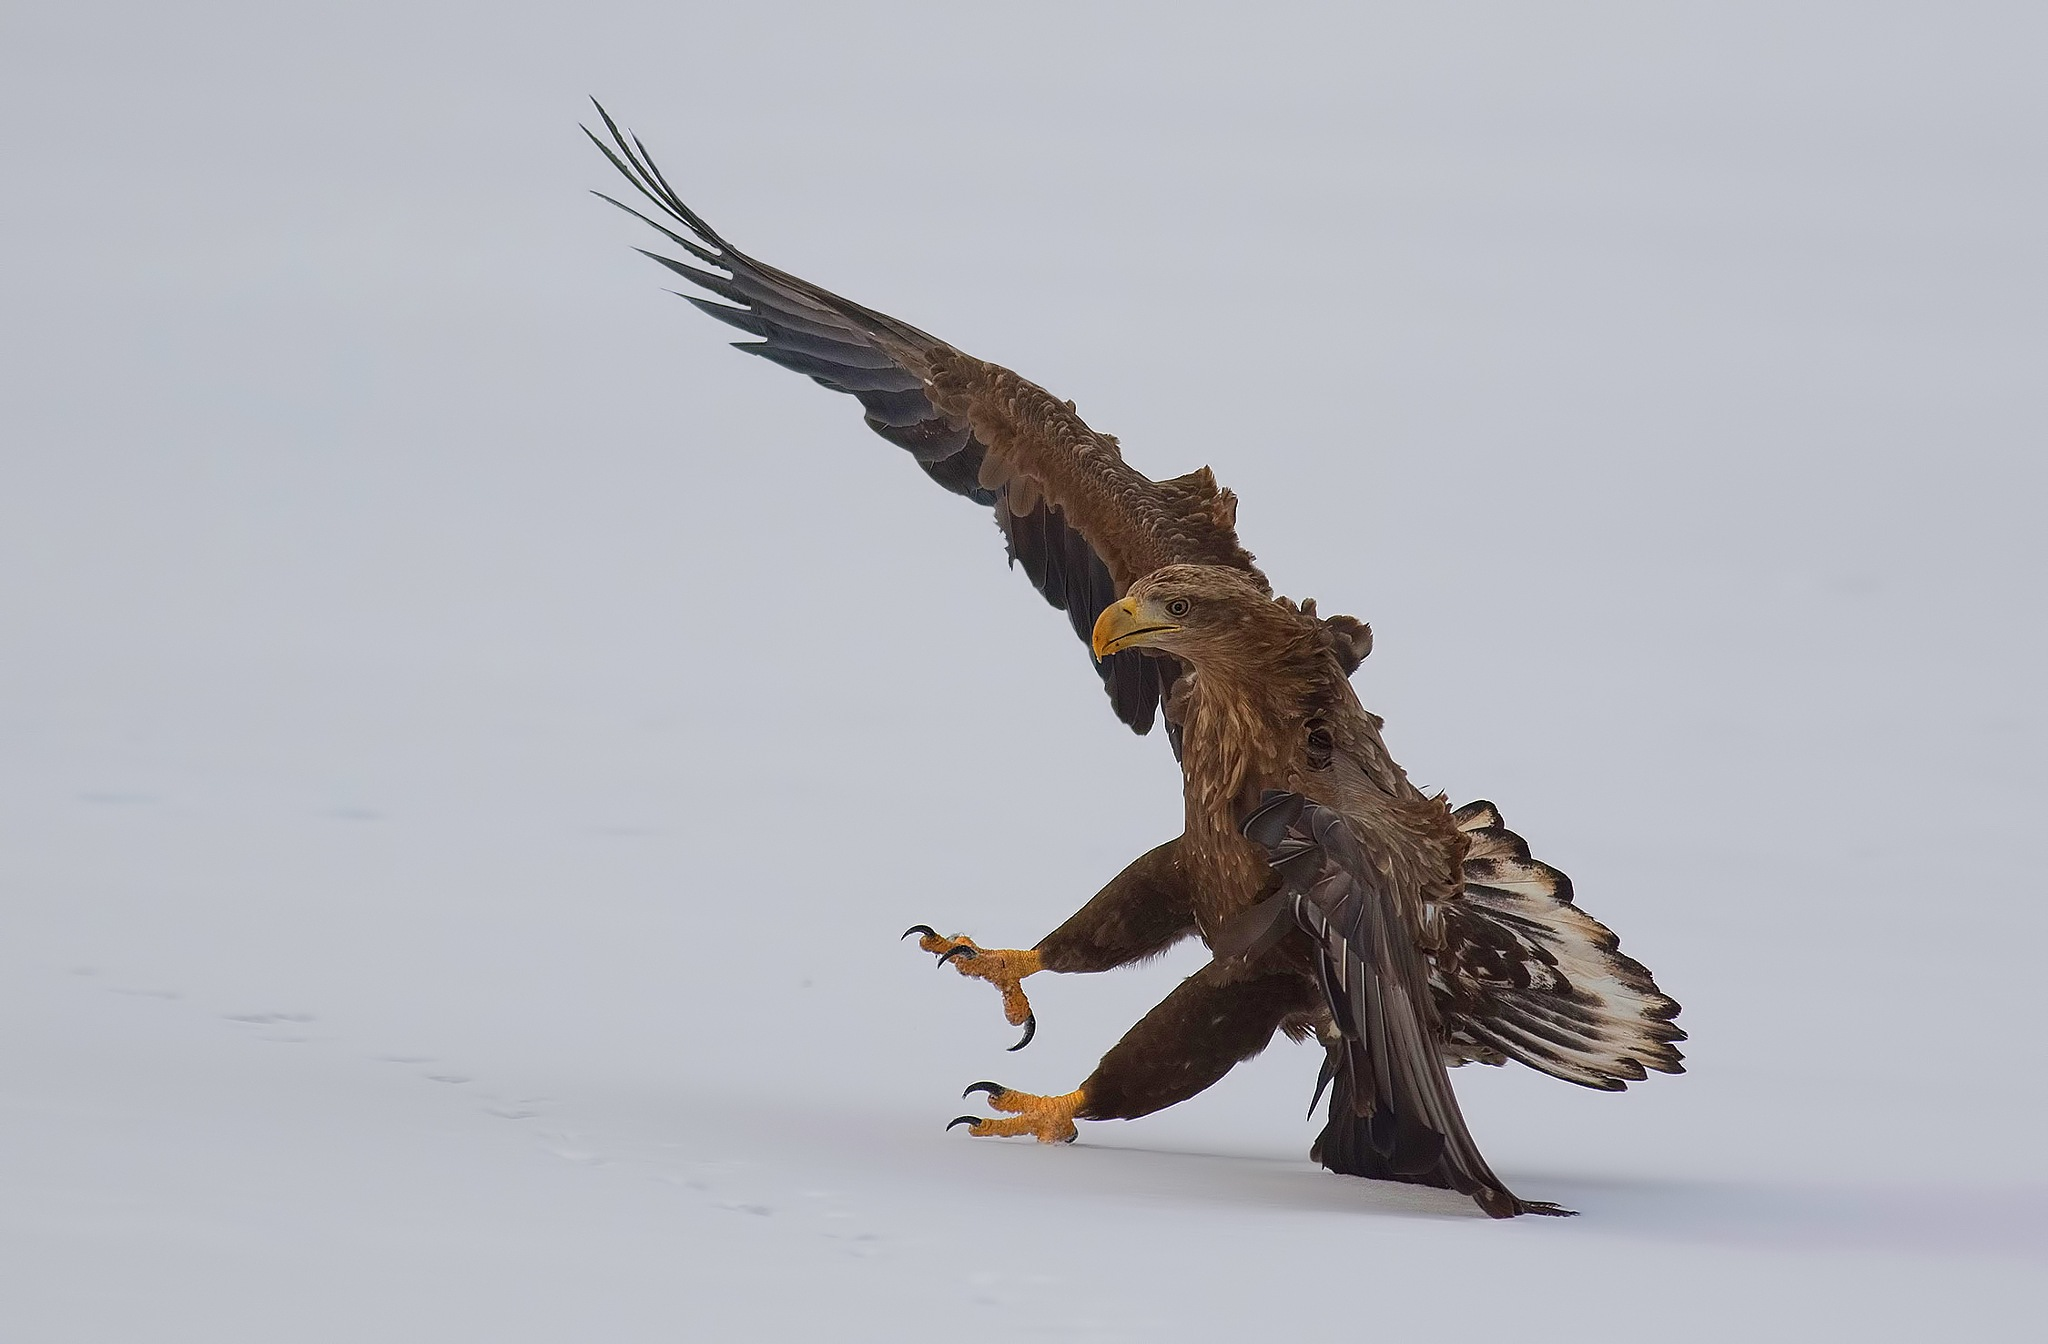 white-tailed eagle by ihsan çiçek